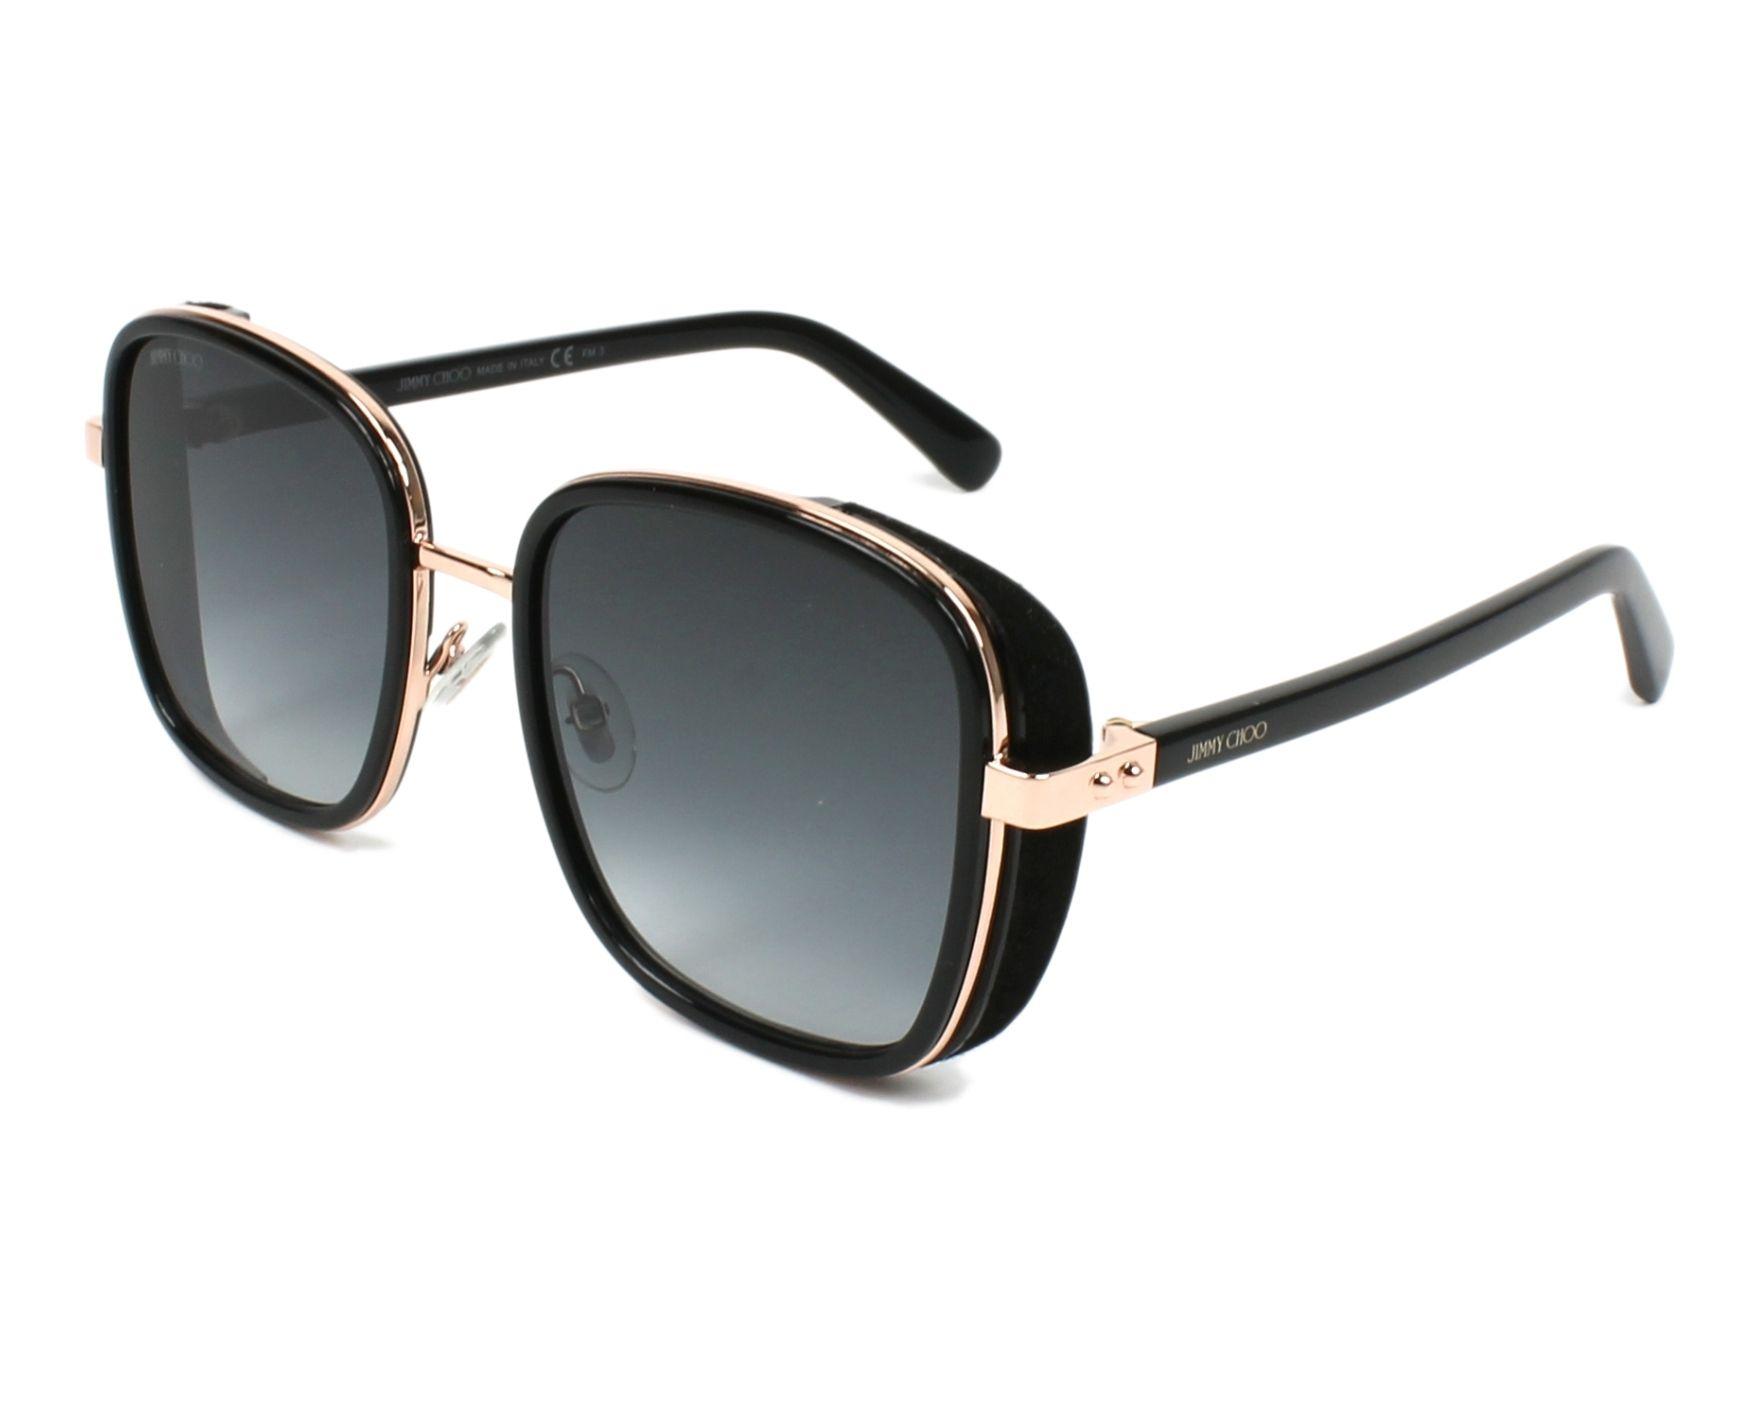 01ff613f2e8d Sunglasses Jimmy Choo ELVA-S 2M2 90 54-20 Black Gold Copper profile